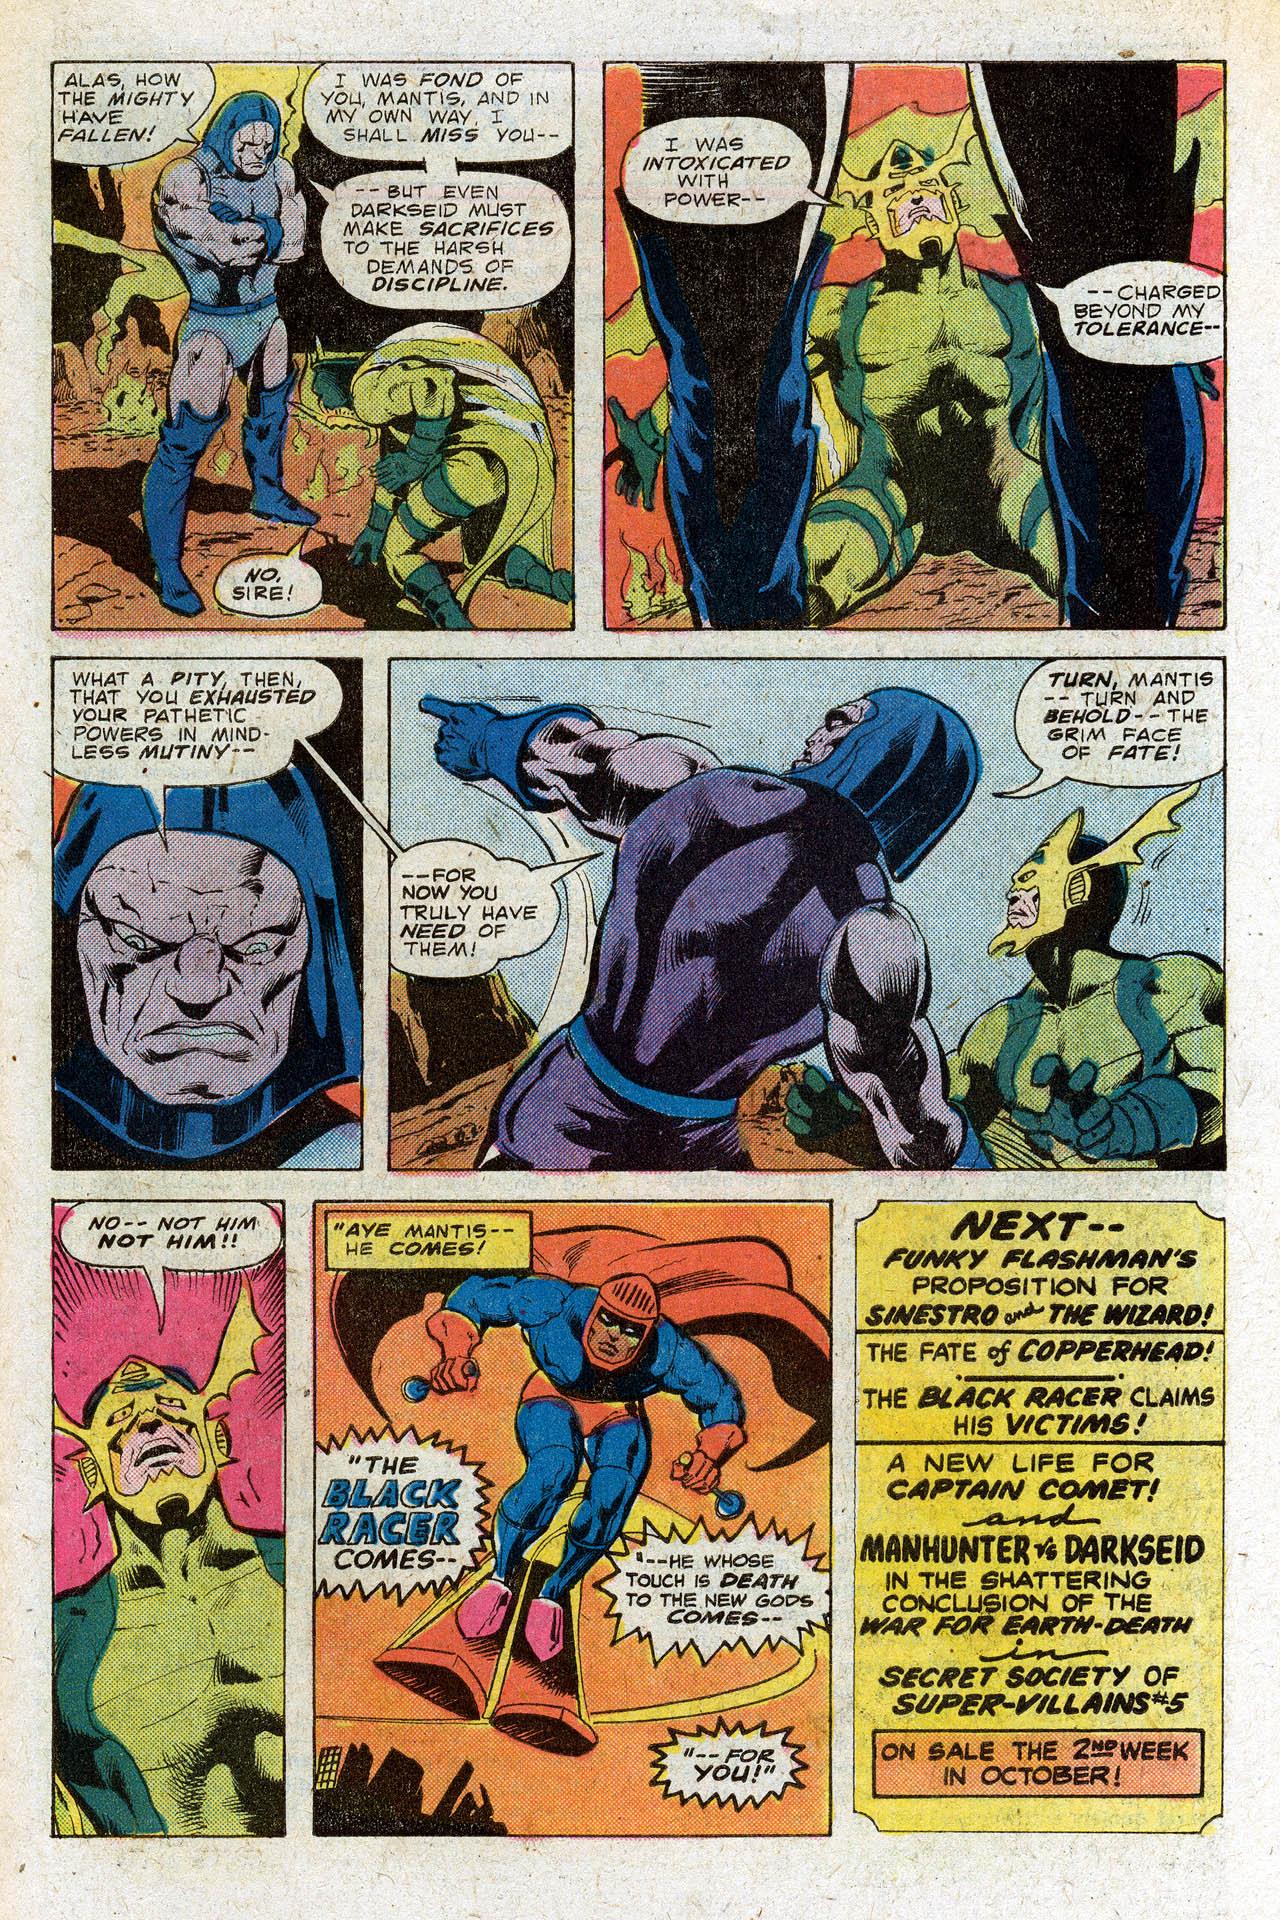 Read online Secret Society of Super-Villains comic -  Issue #4 - 30